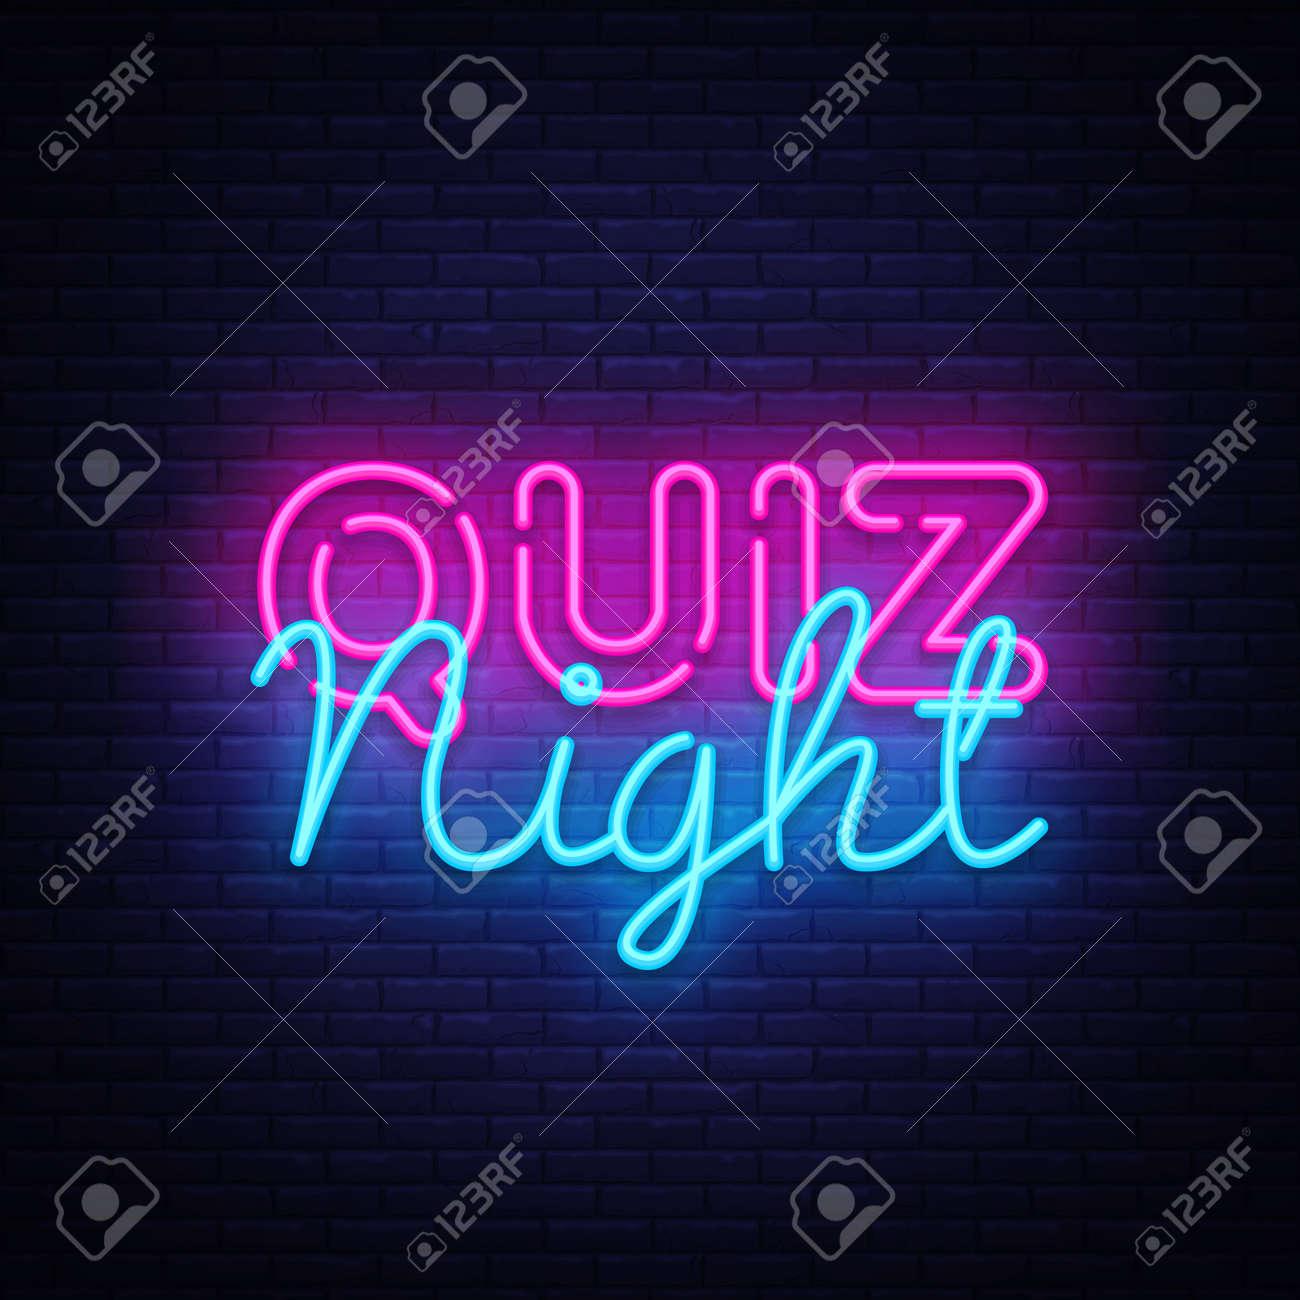 Quiz night announcement poster vector design template. Quiz night neon signboard, light banner. Pub quiz held in pub or bar, night club. Pub team game. Questions game bright retro light sign. Vector - 103259429